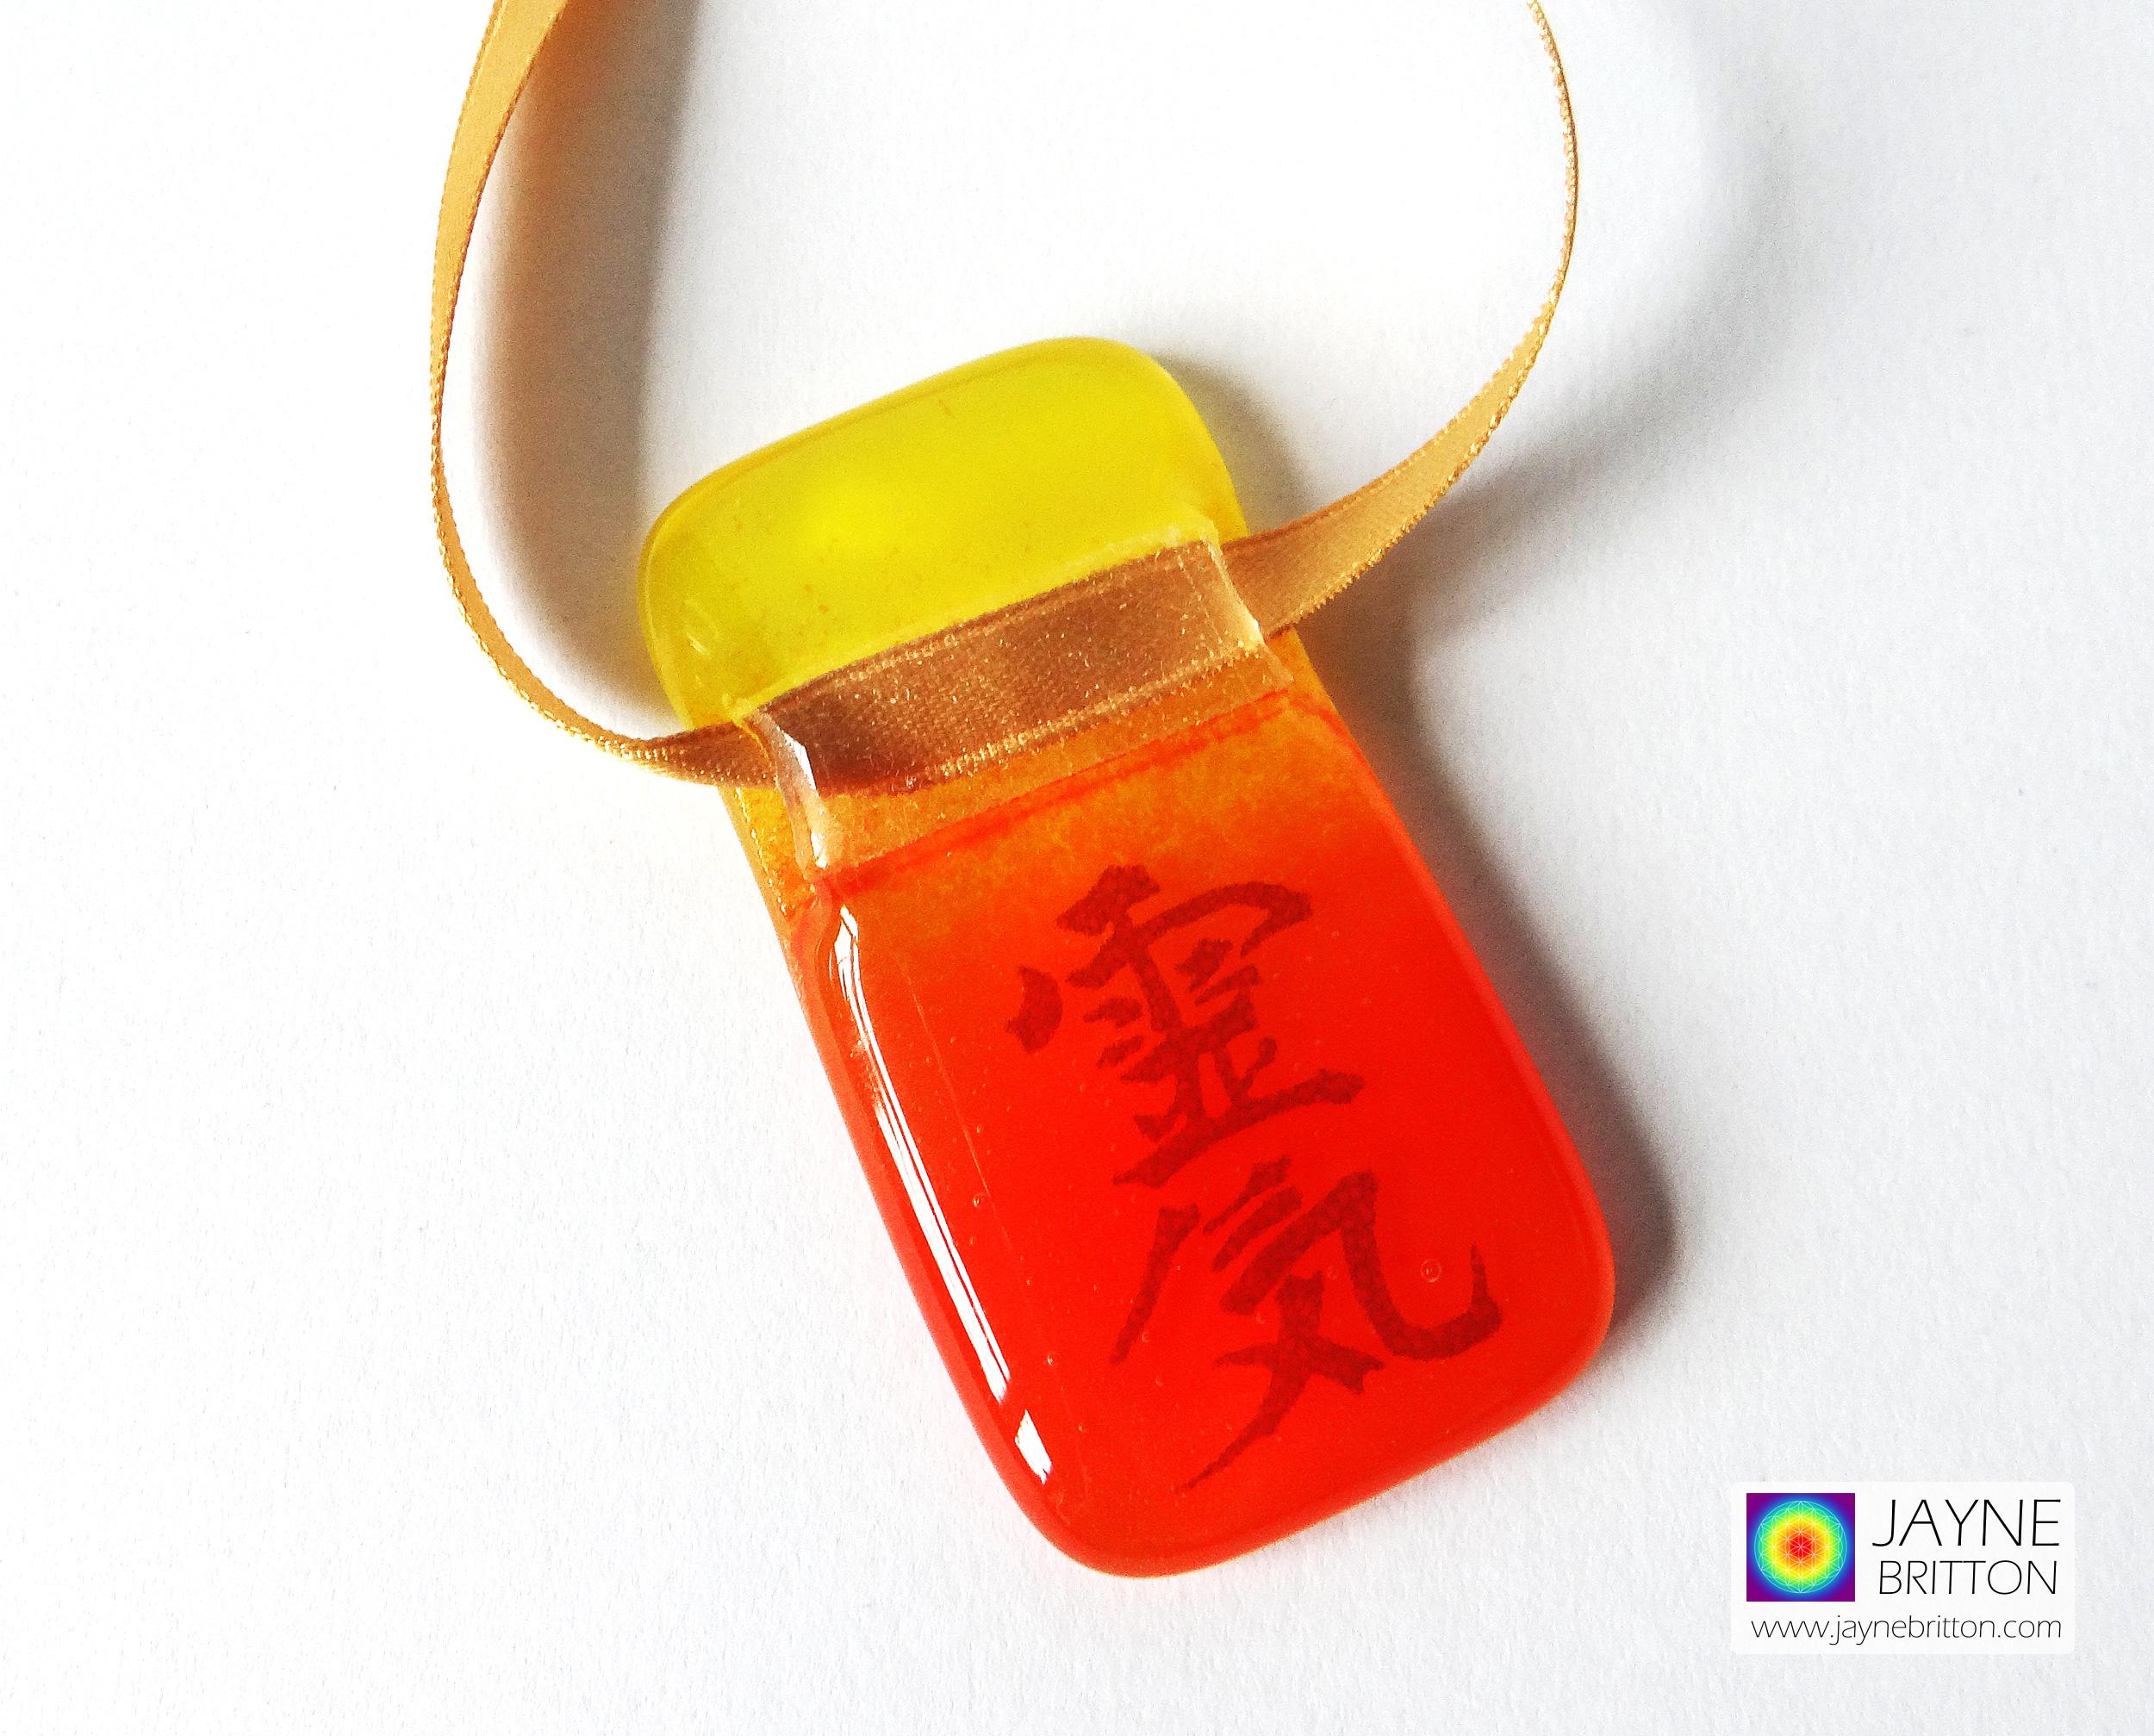 Reiki symbol light catcher - orange and yellow blend